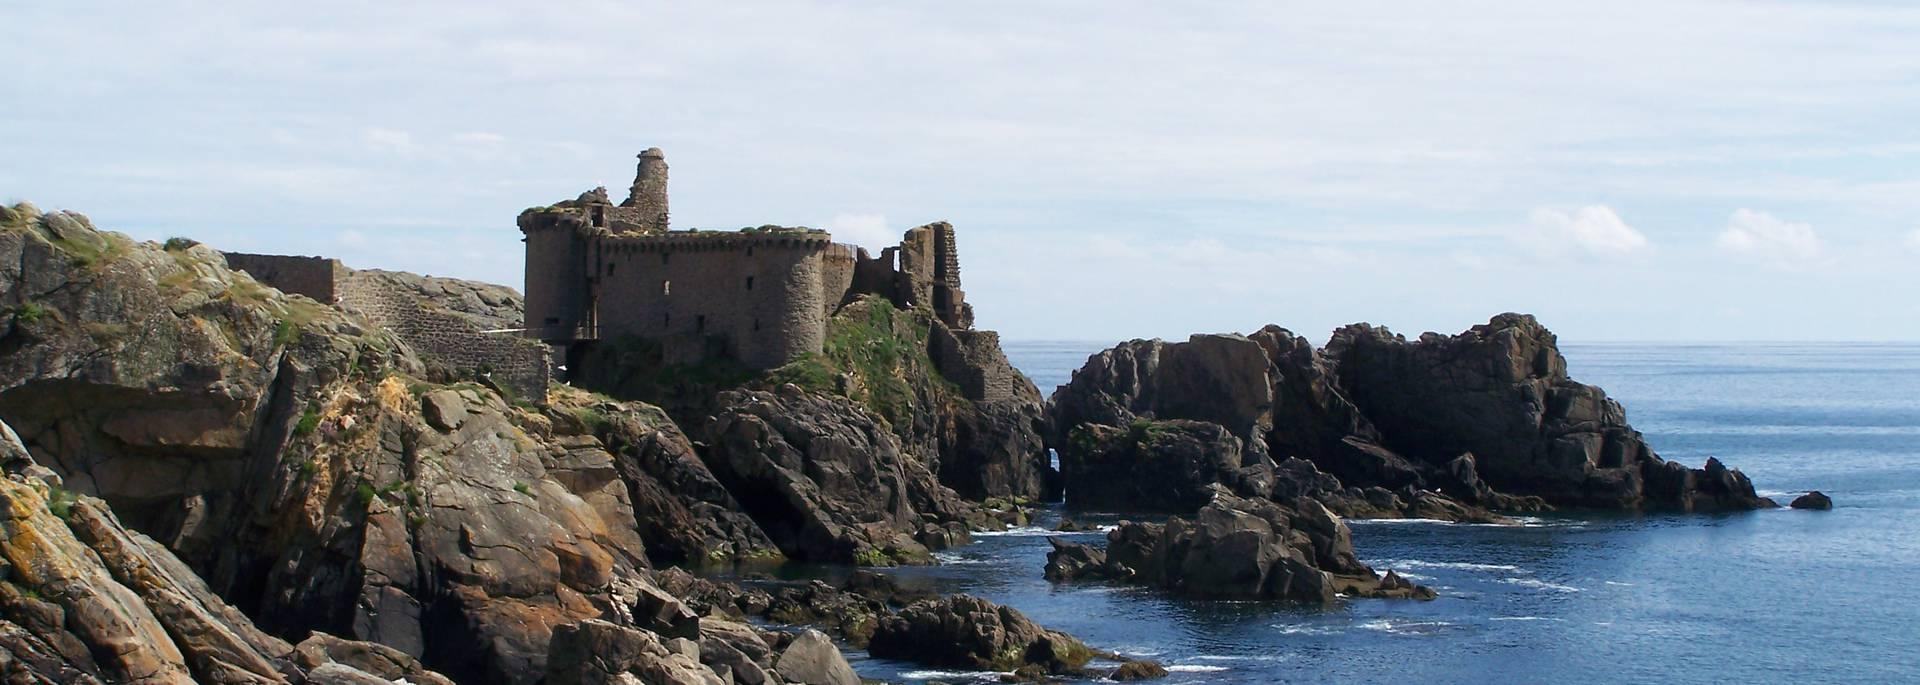 Die Alte Festung, Ile d'Yeu © F. Guerineau / OT île d'Yeu